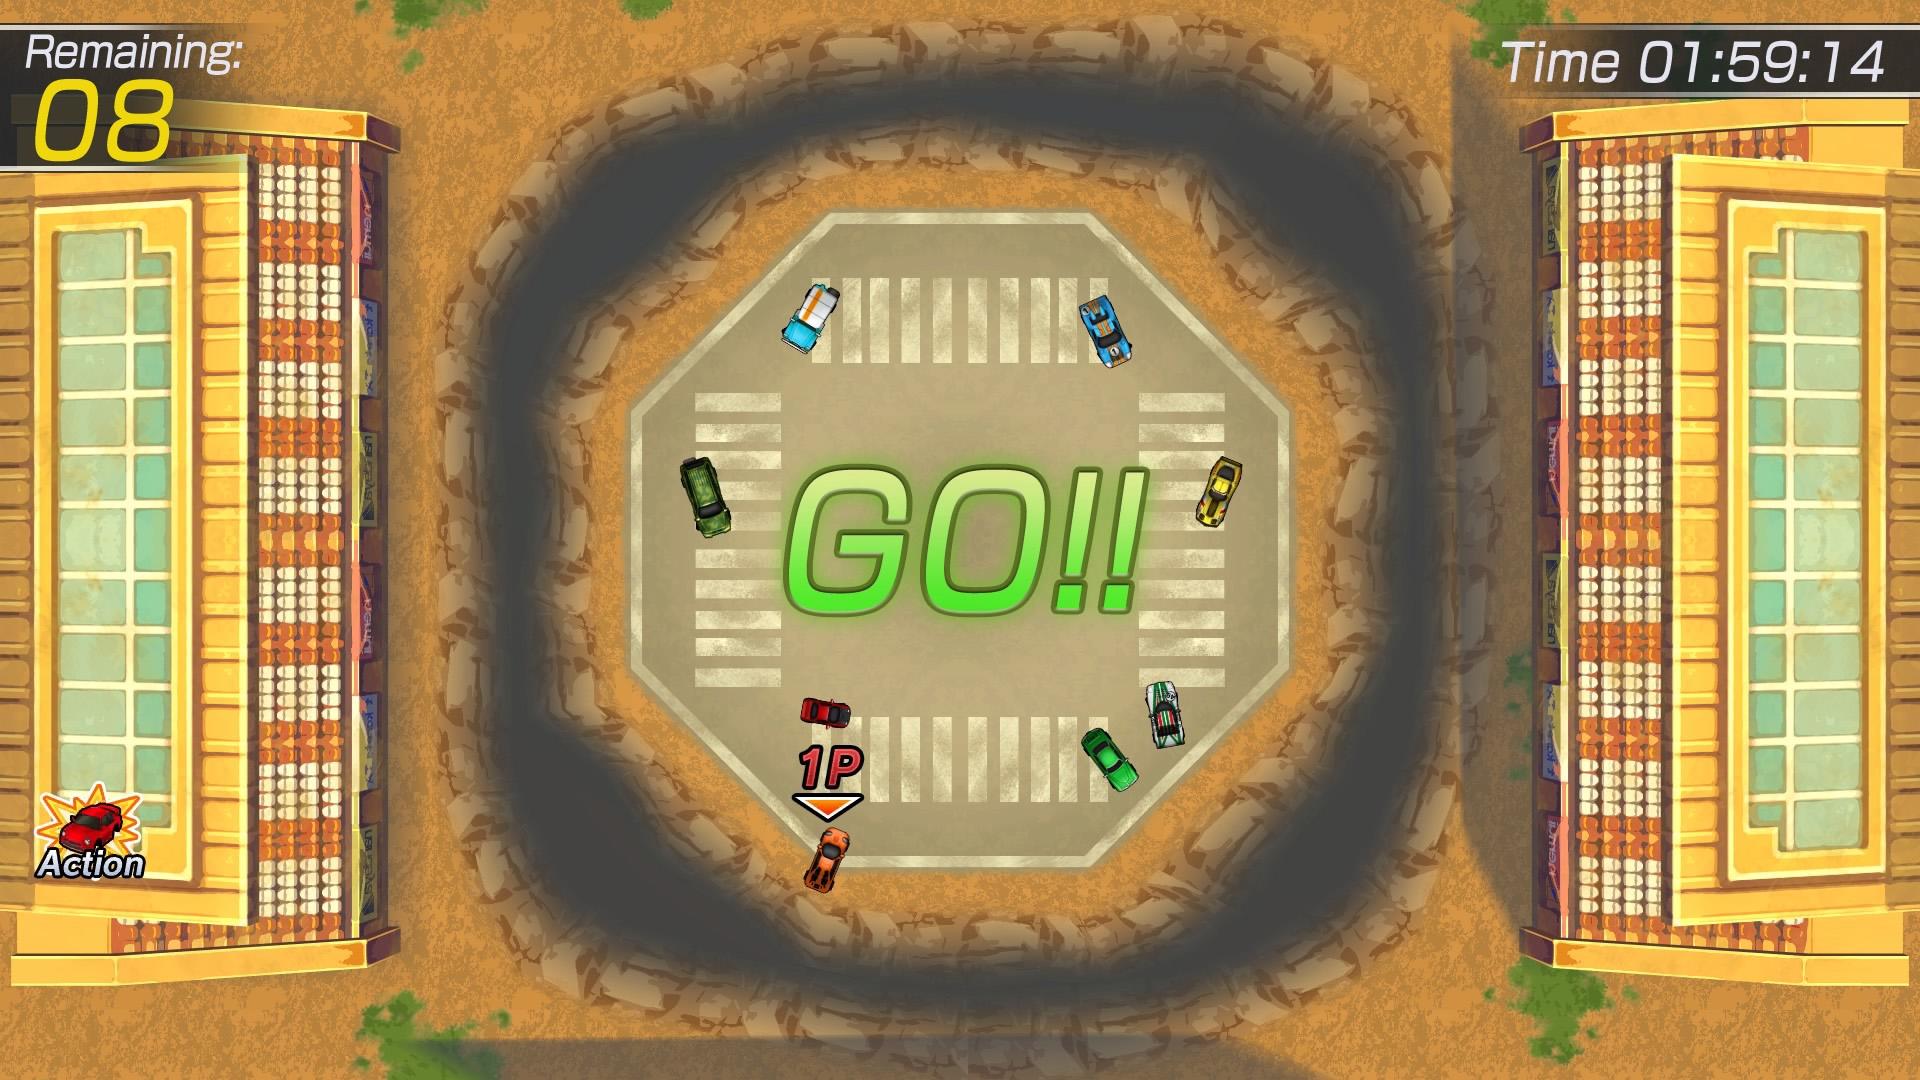 Gotcha Racing 2nd | ROW (1295edee-8d1a-4f19-ba1b-b5370e8d39e7)